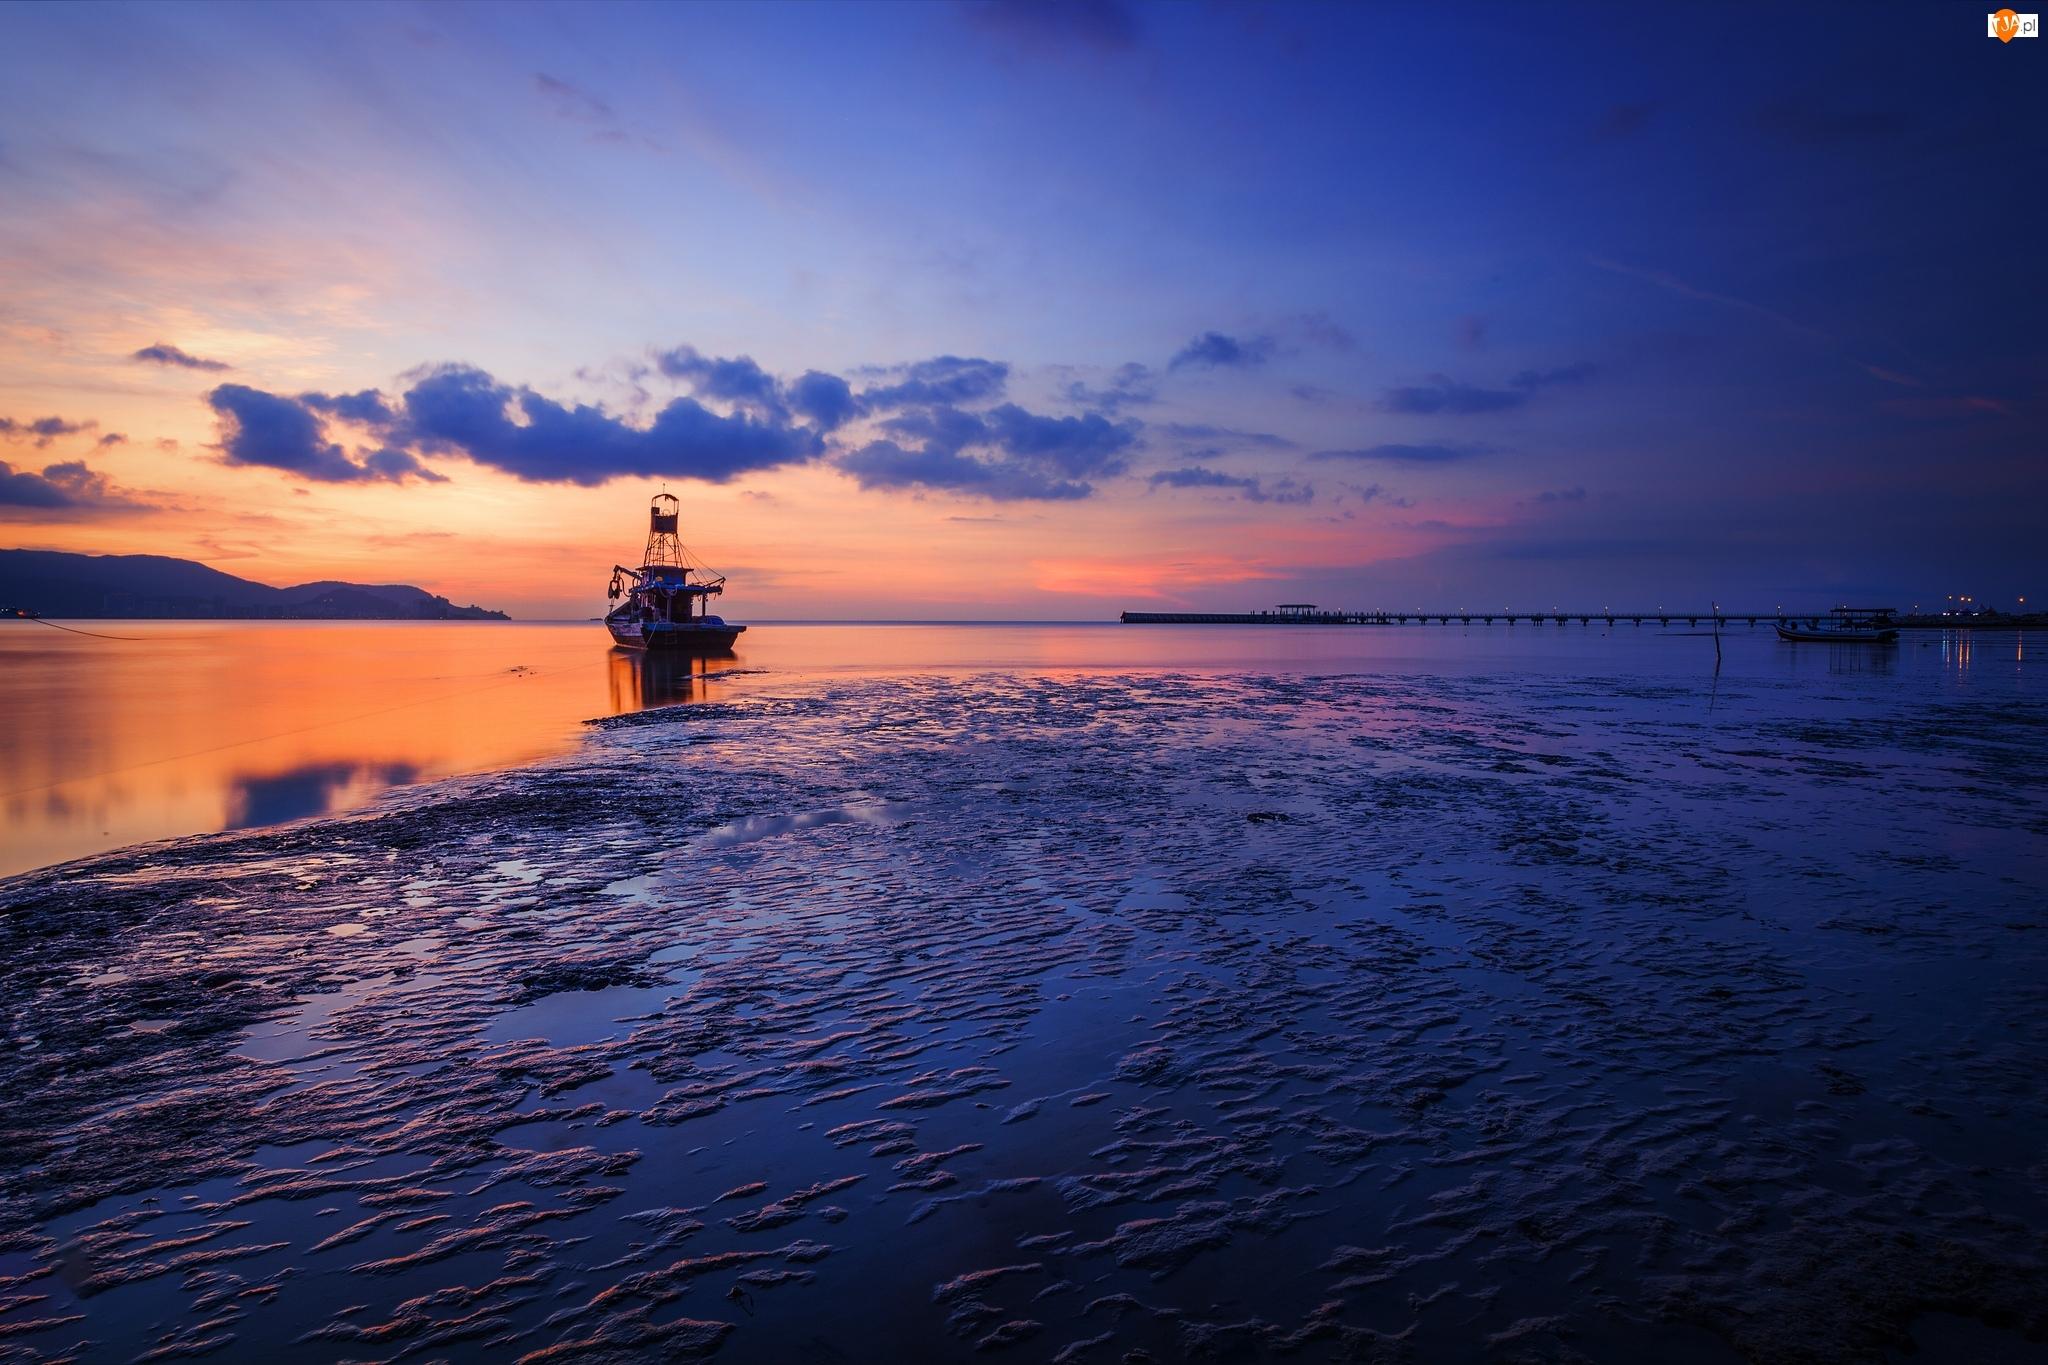 Kuter, Zachód słońca, Morze, Chmury